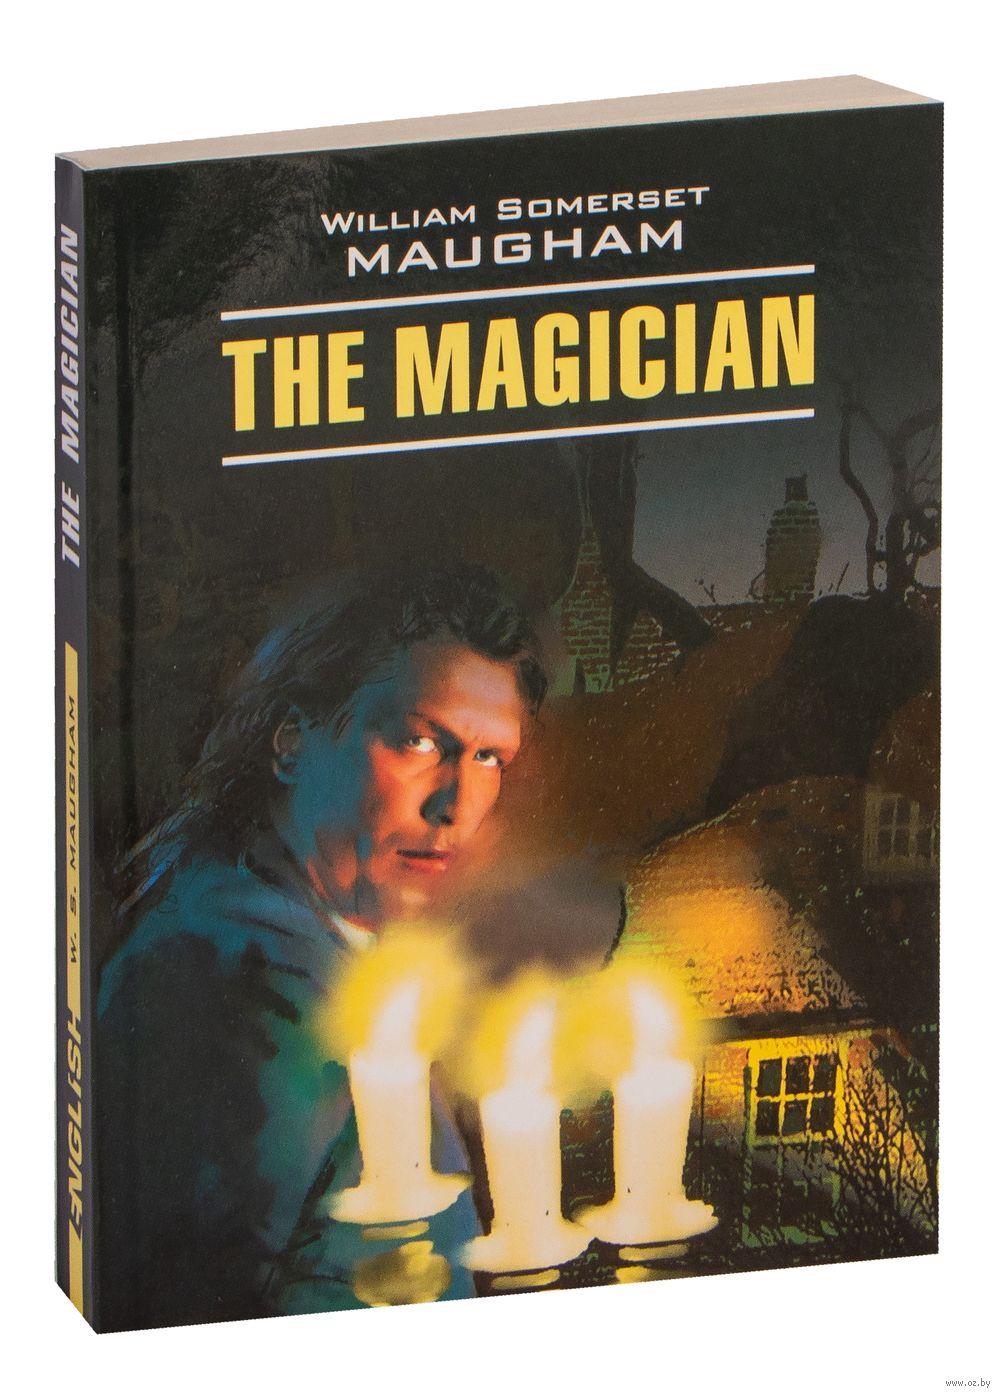 the magic skin essay